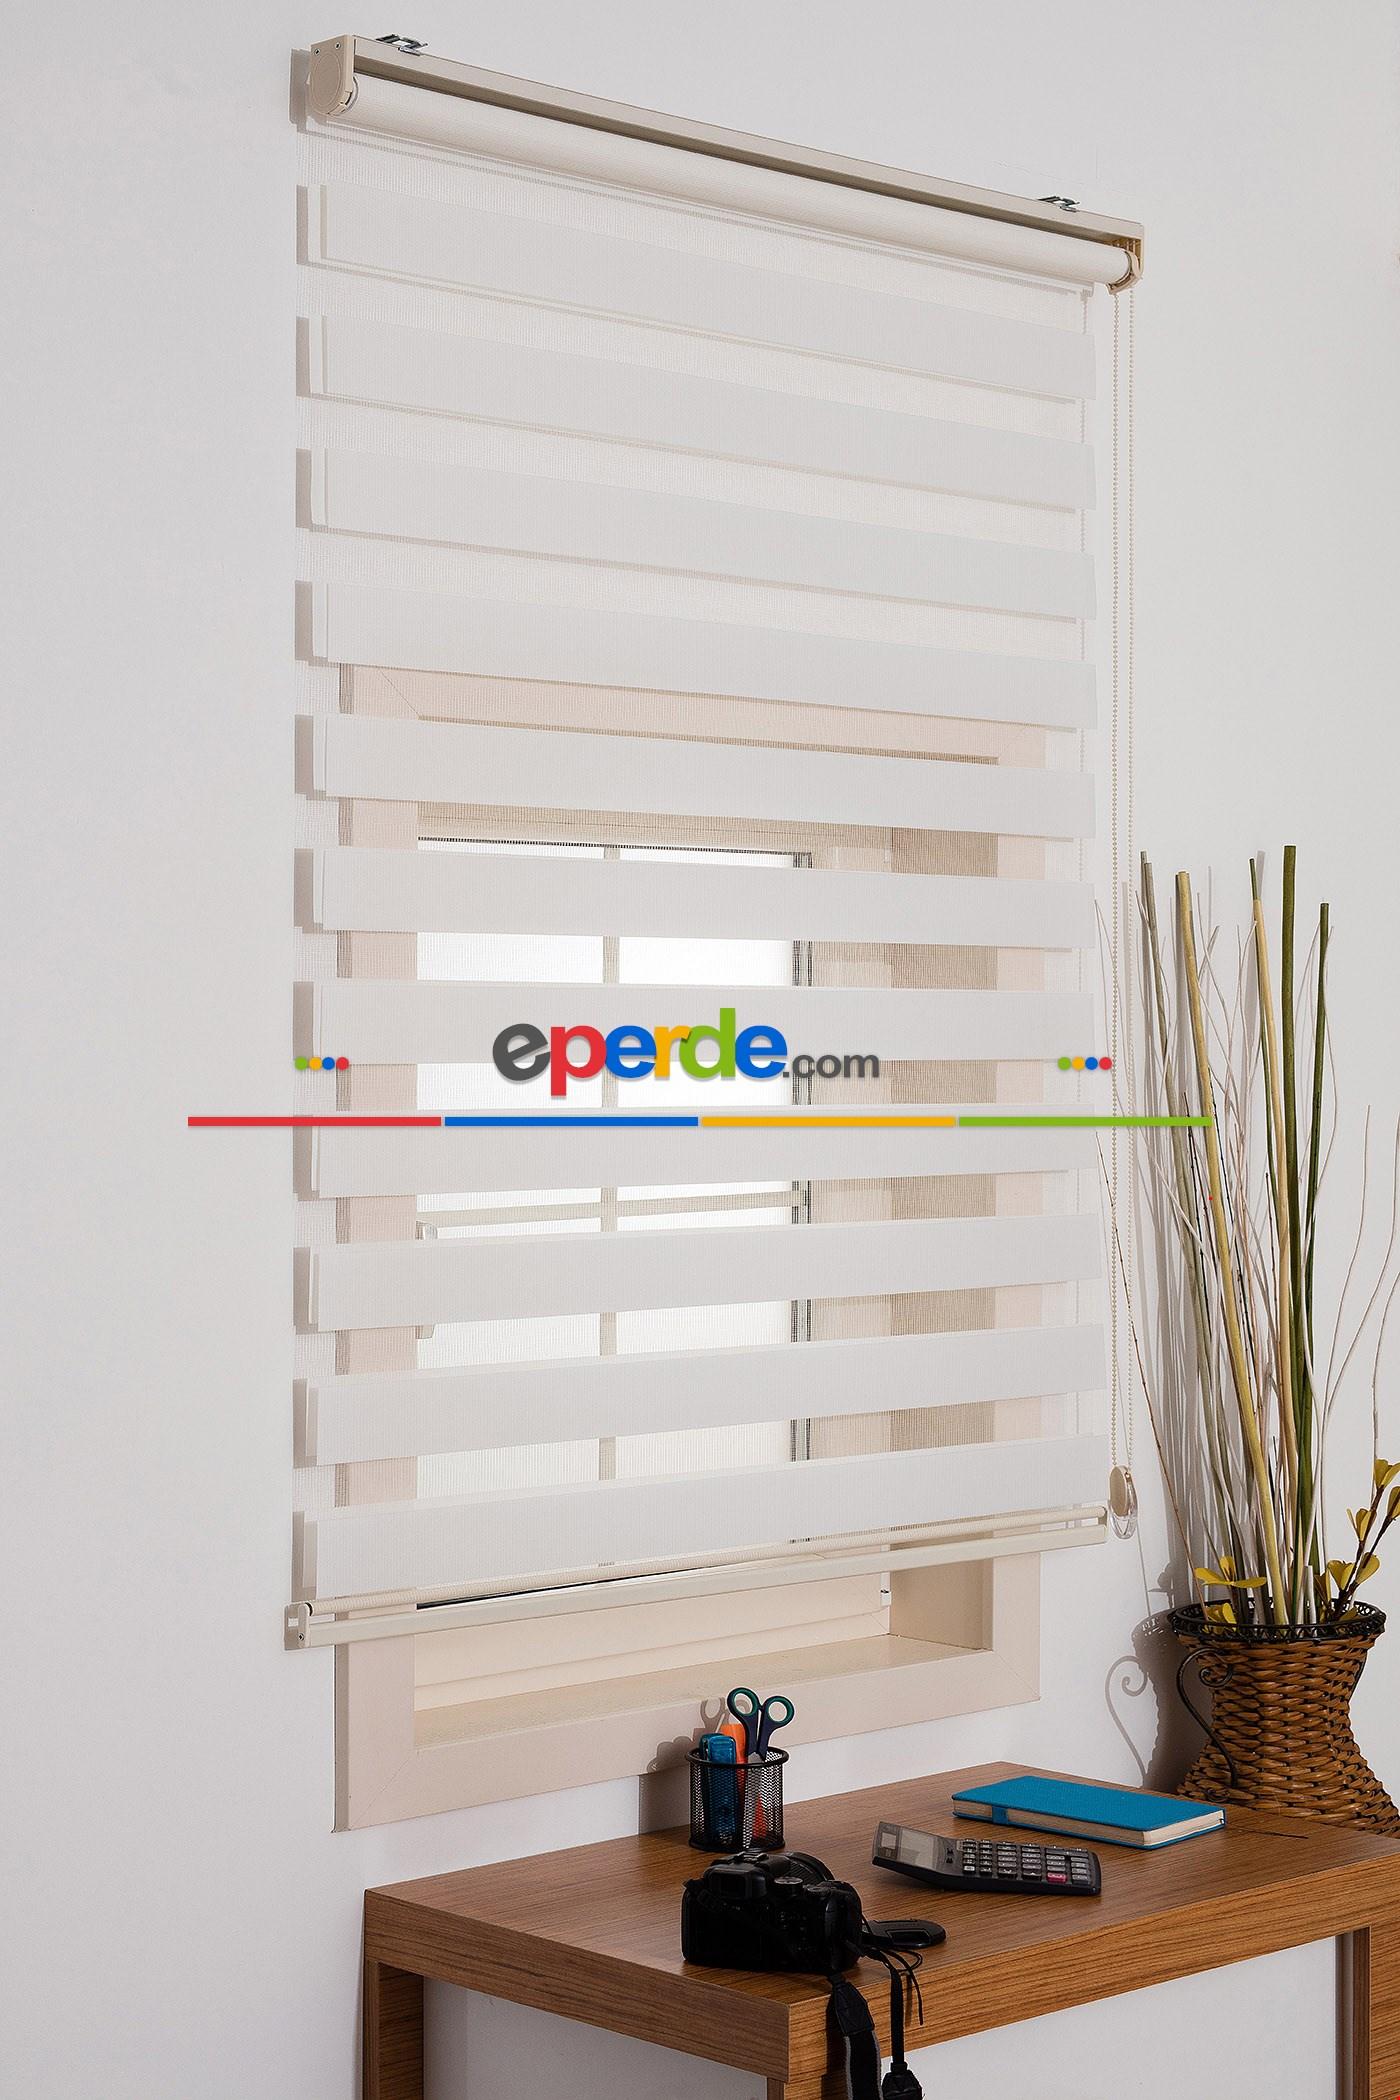 Fırsat!!! Kalın Bambu Lüx Ekru Zebra Perde ( Ücretsiz Etek Dilim ) Ekru